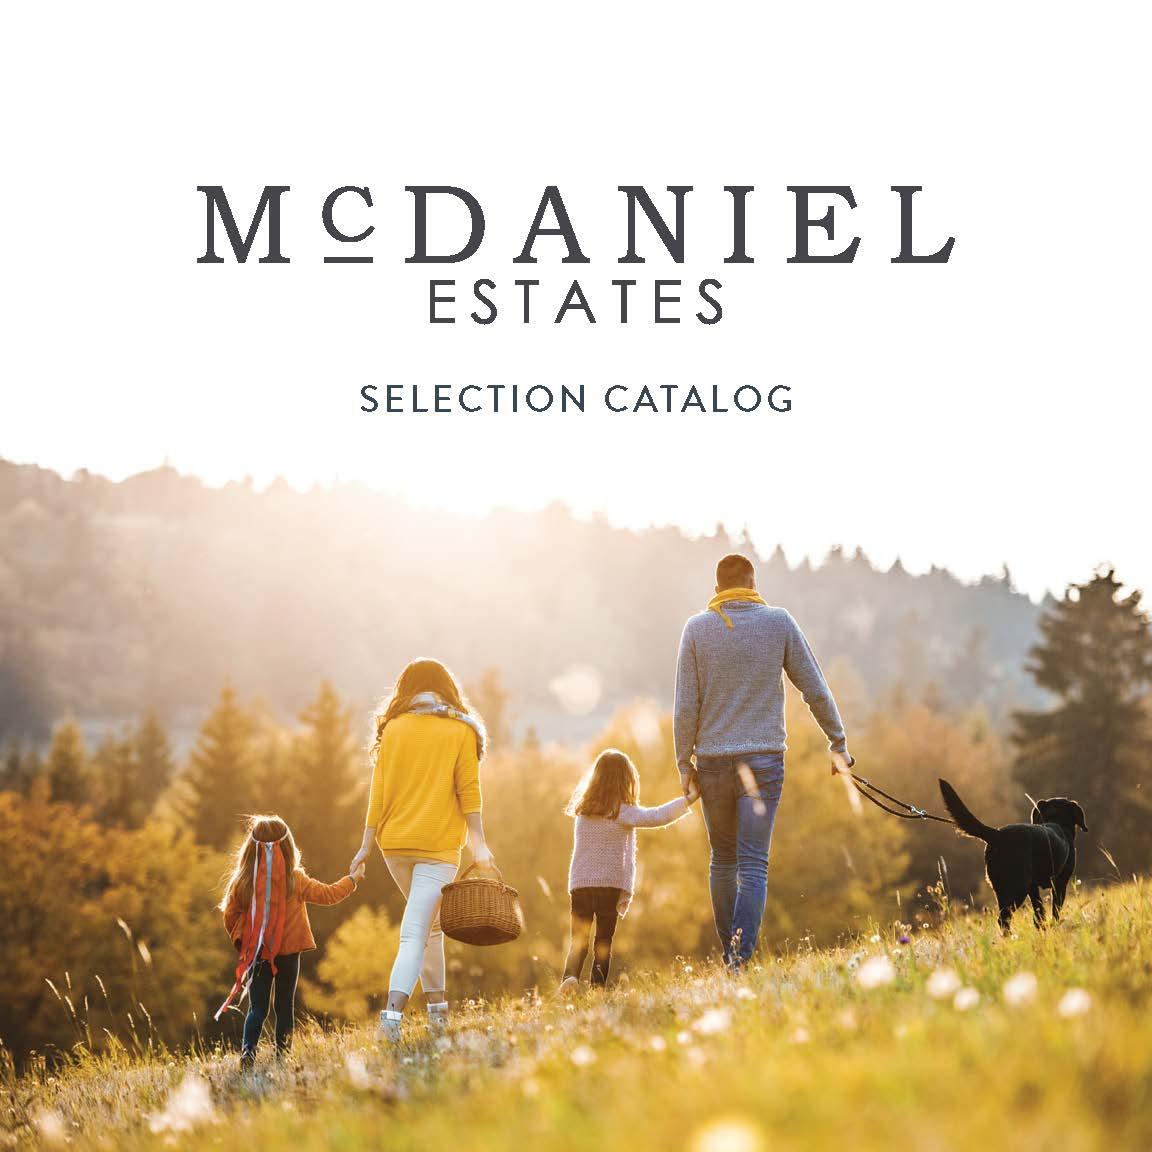 mcdaniel estates selection catalog